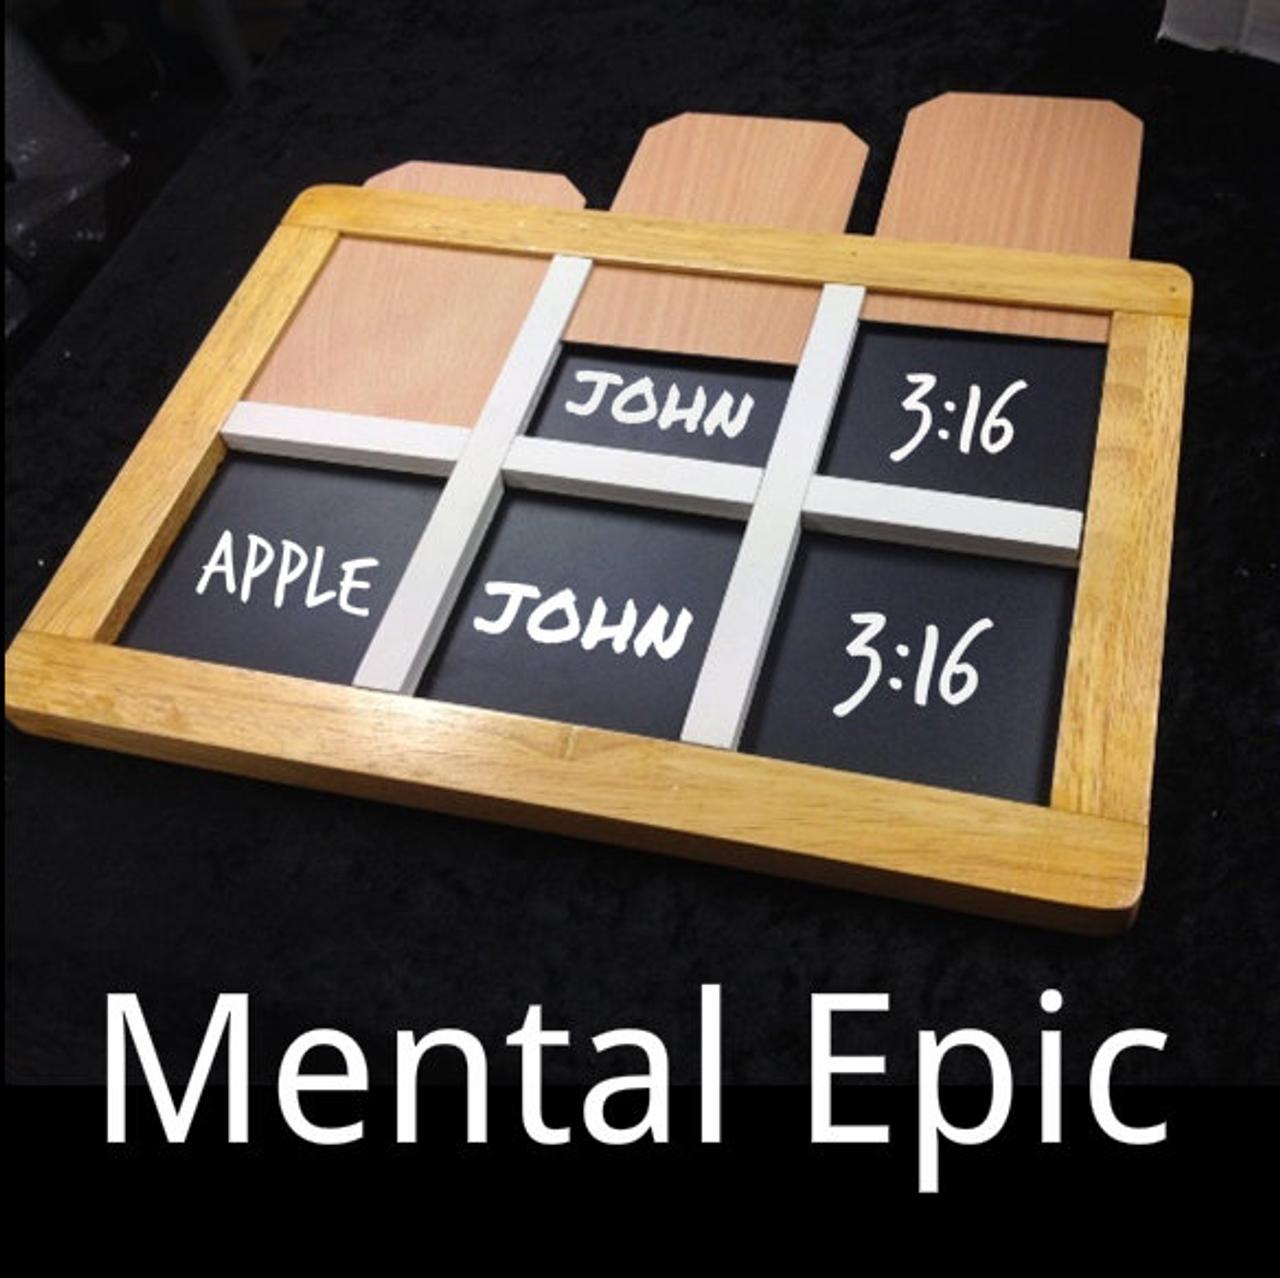 Mental Epic Standard Mind Magic Trick Mentalism Gospel